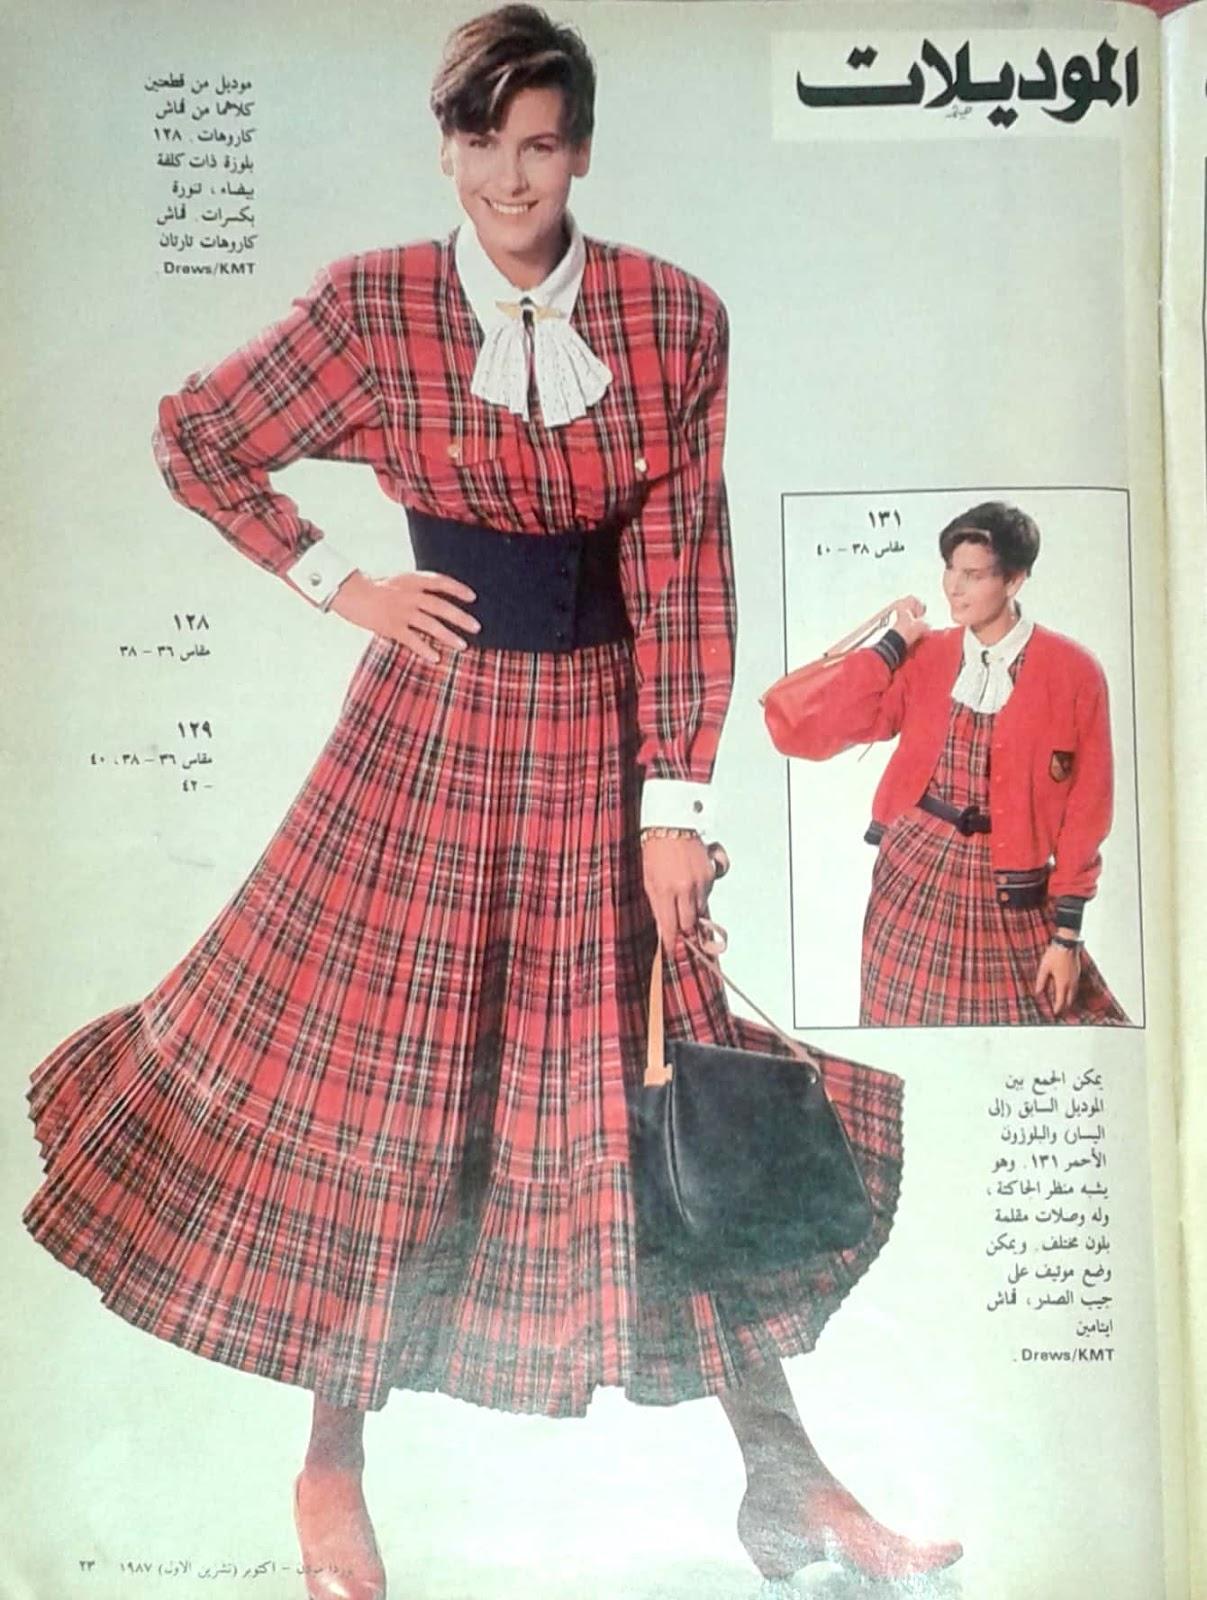 6dede0850733d تحميل مجلة بوردا بالعربي اصدار شهر اكتوبر ~ تعليم خياطة-Learn sewing